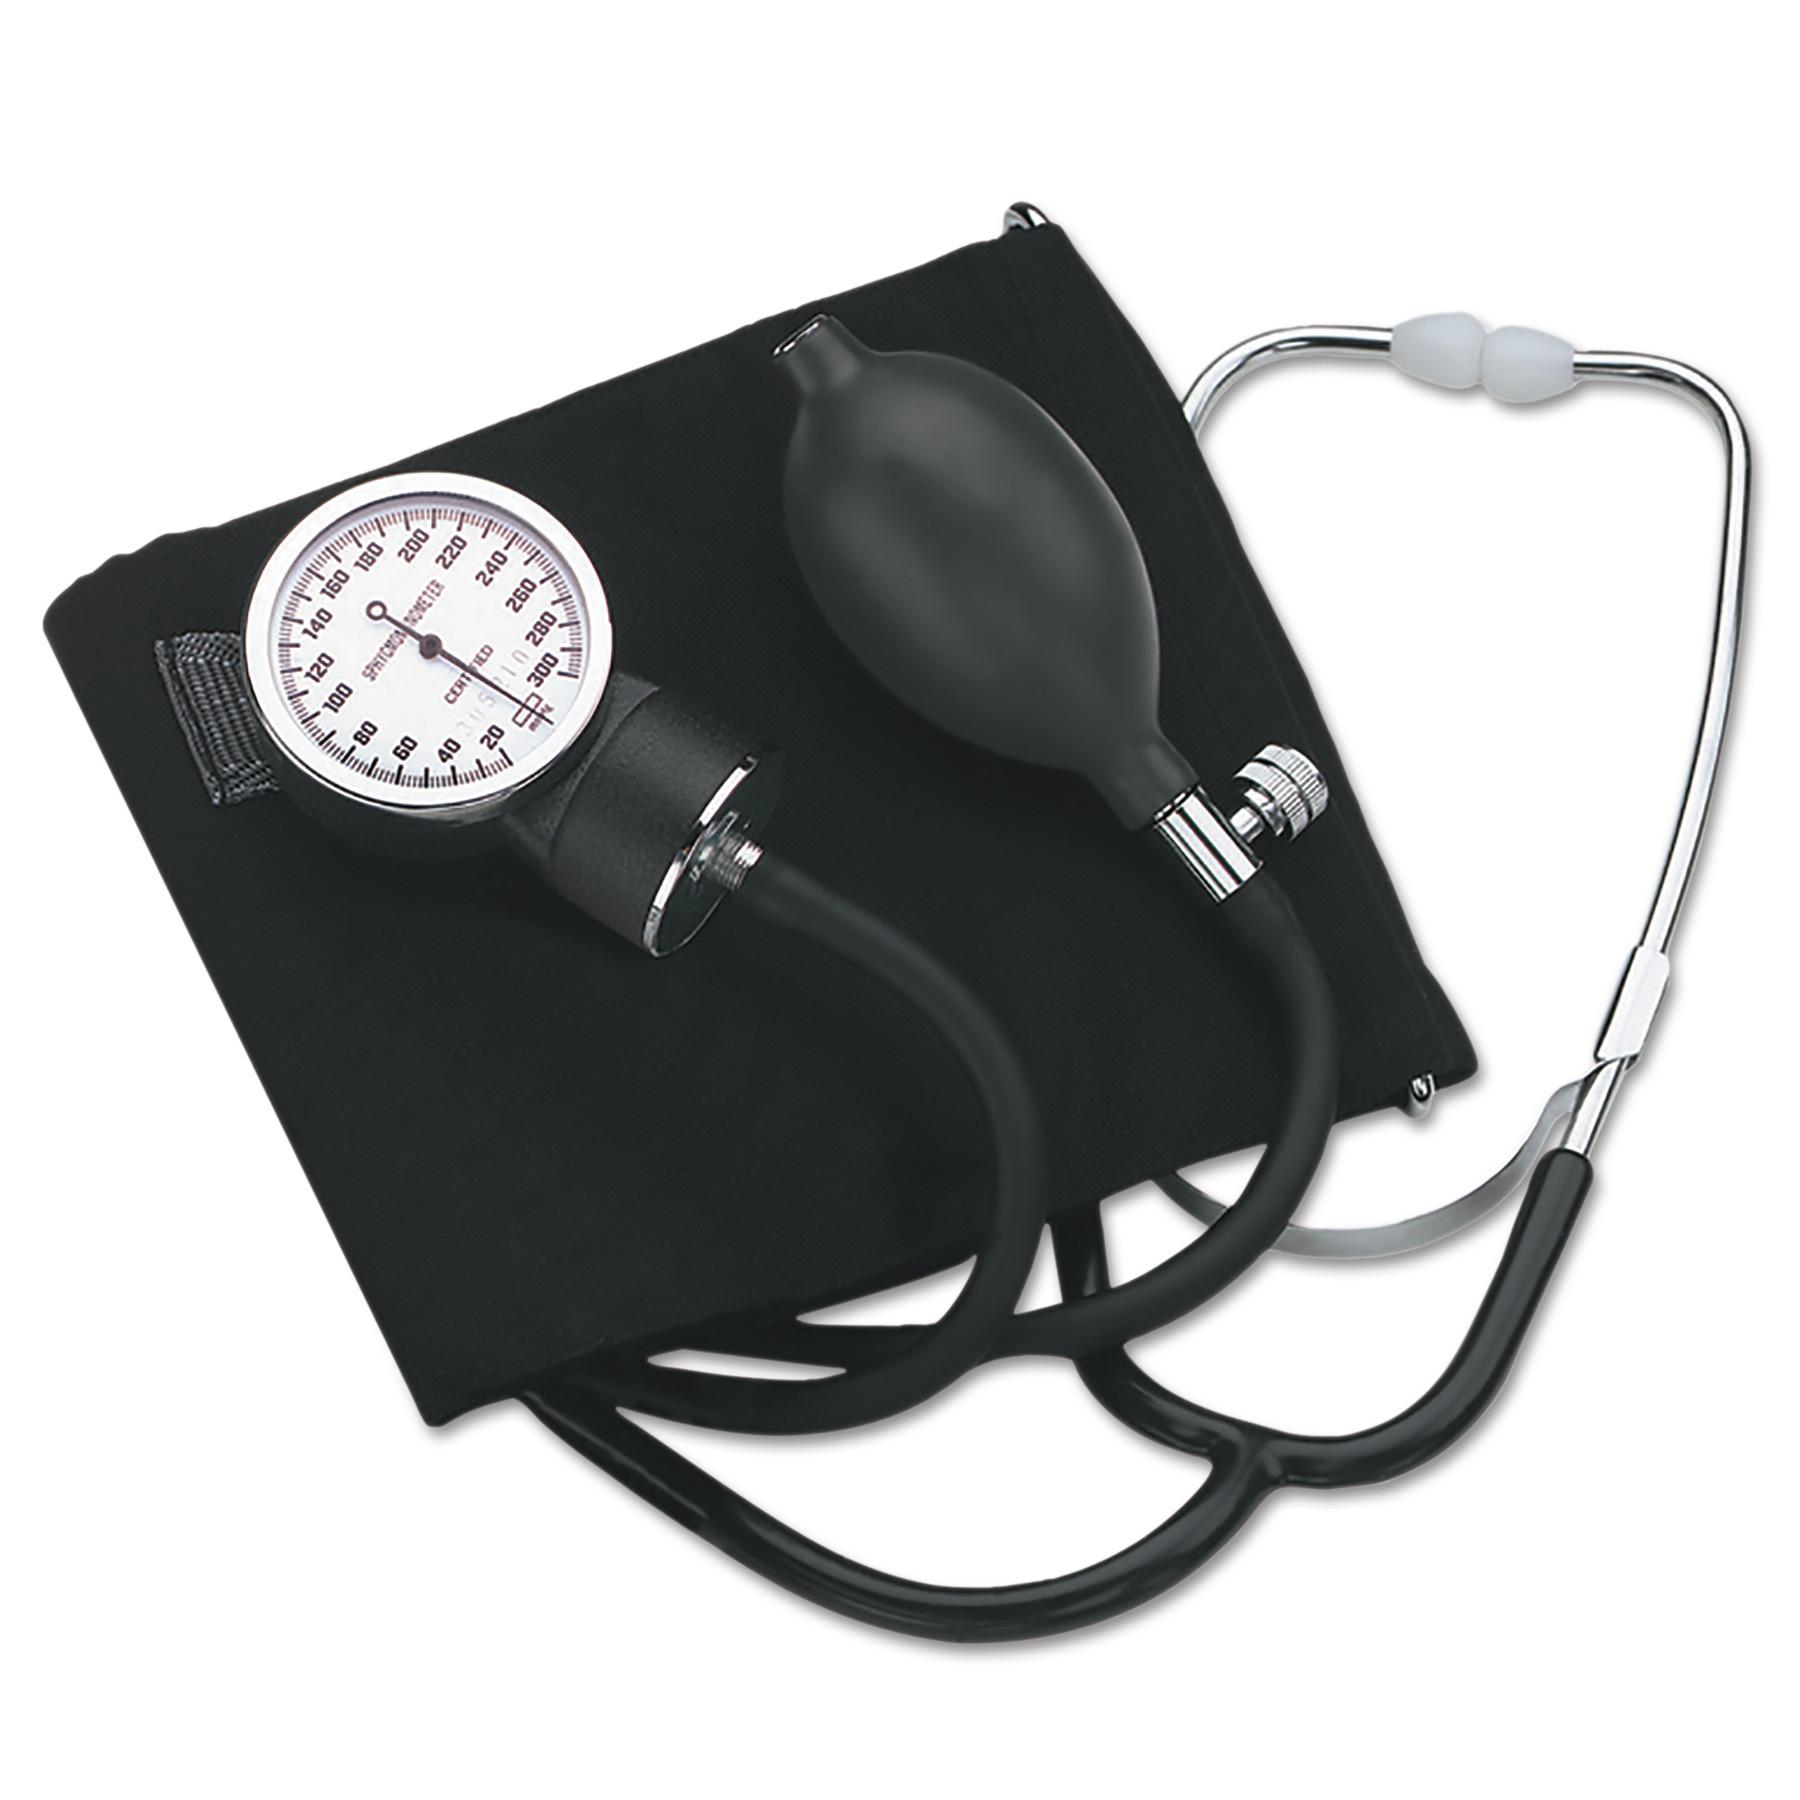 "HealthSmart Self-Taking Home Blood Pressure Kit, 22"" Stethoscope, Large Adult"